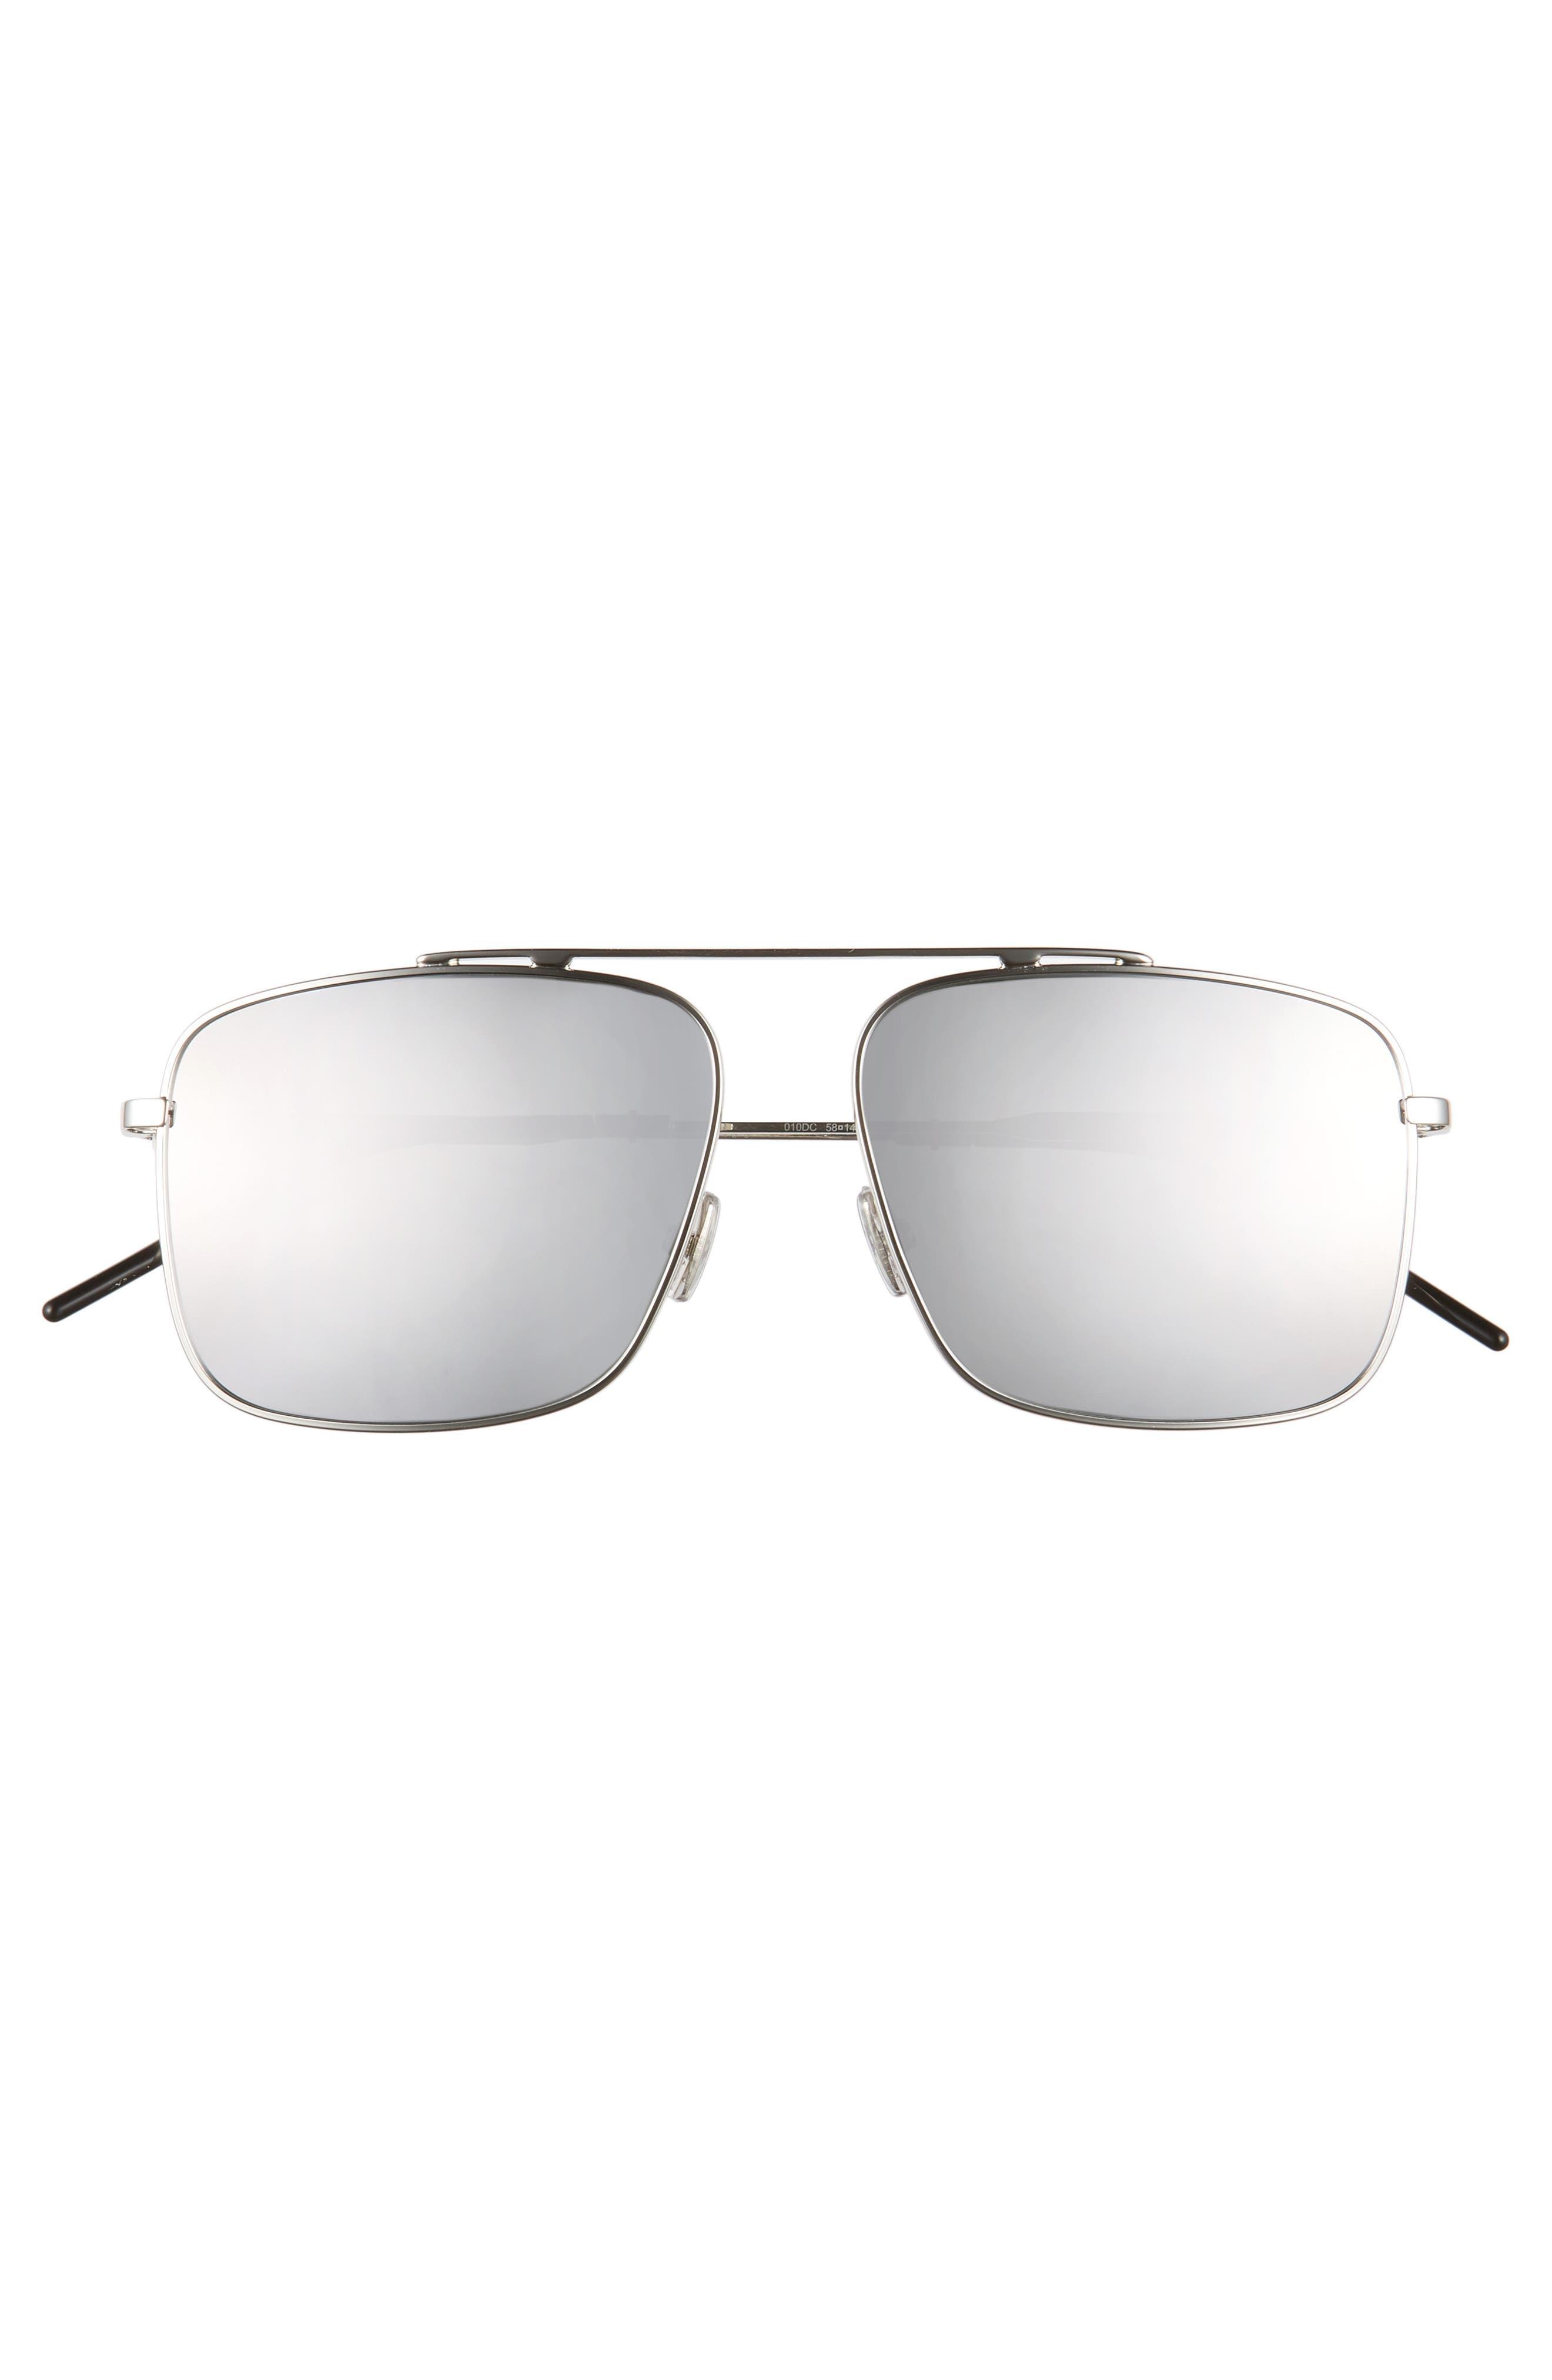 58mm Mirrored Navigator Sunglasses,                             Alternate thumbnail 2, color,                             PALLADIUM